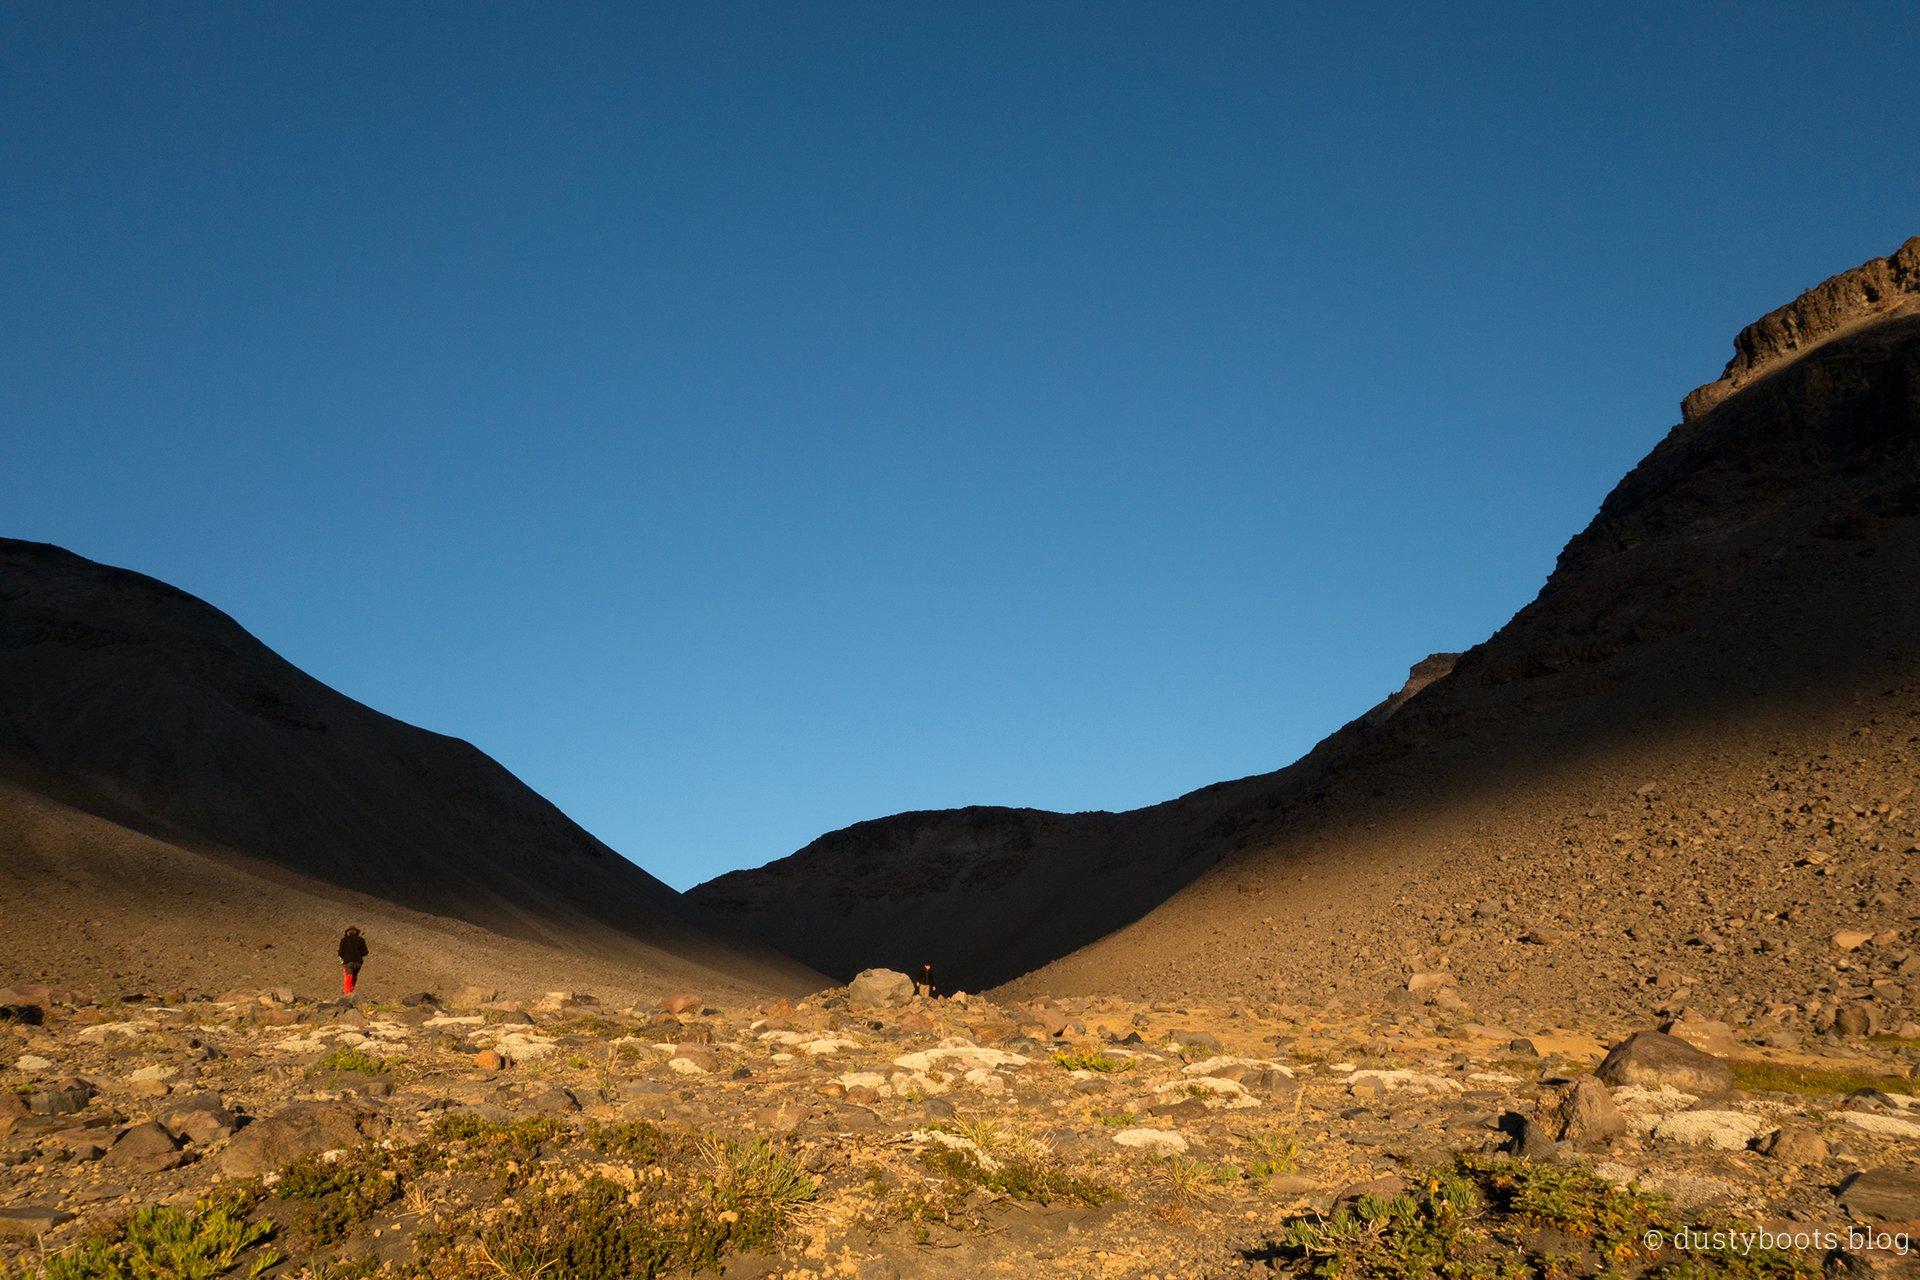 Sonnenuntergang im Valle de Aguas Calientes in Chile